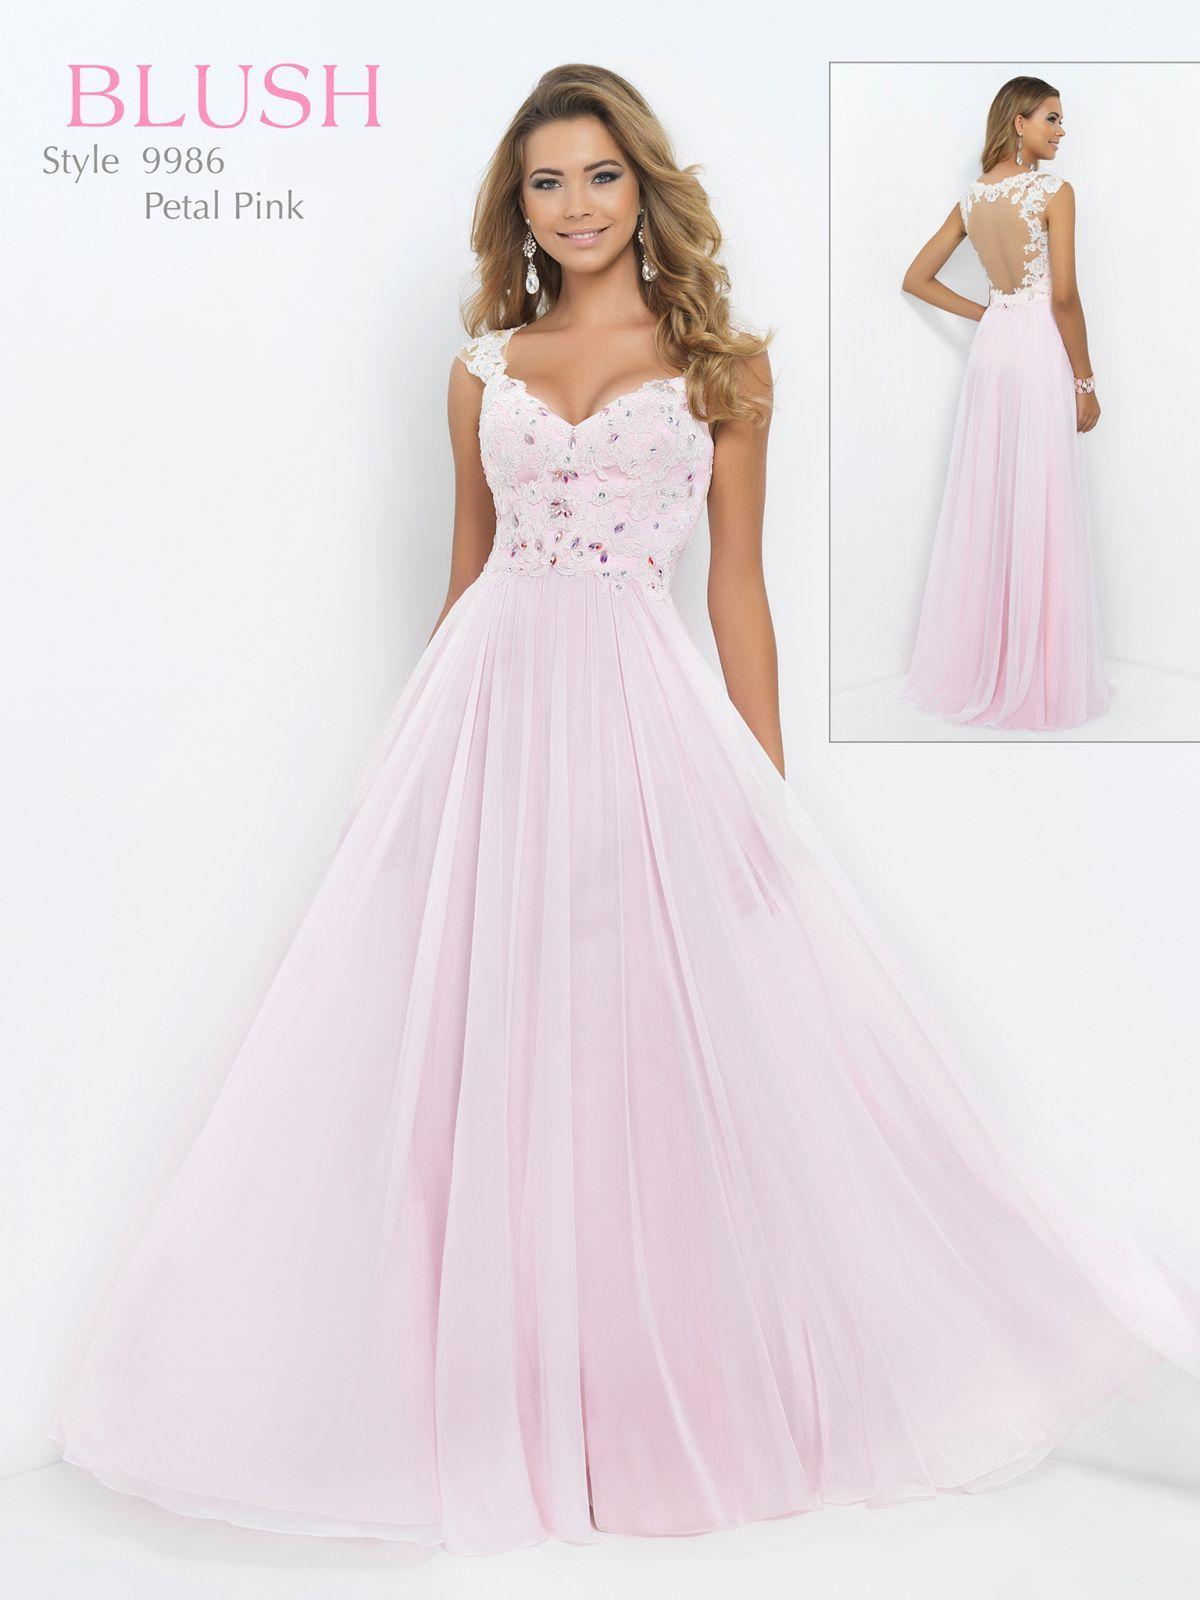 prom-dresses-blush-9986-a-185-lightpink-0001.jpg